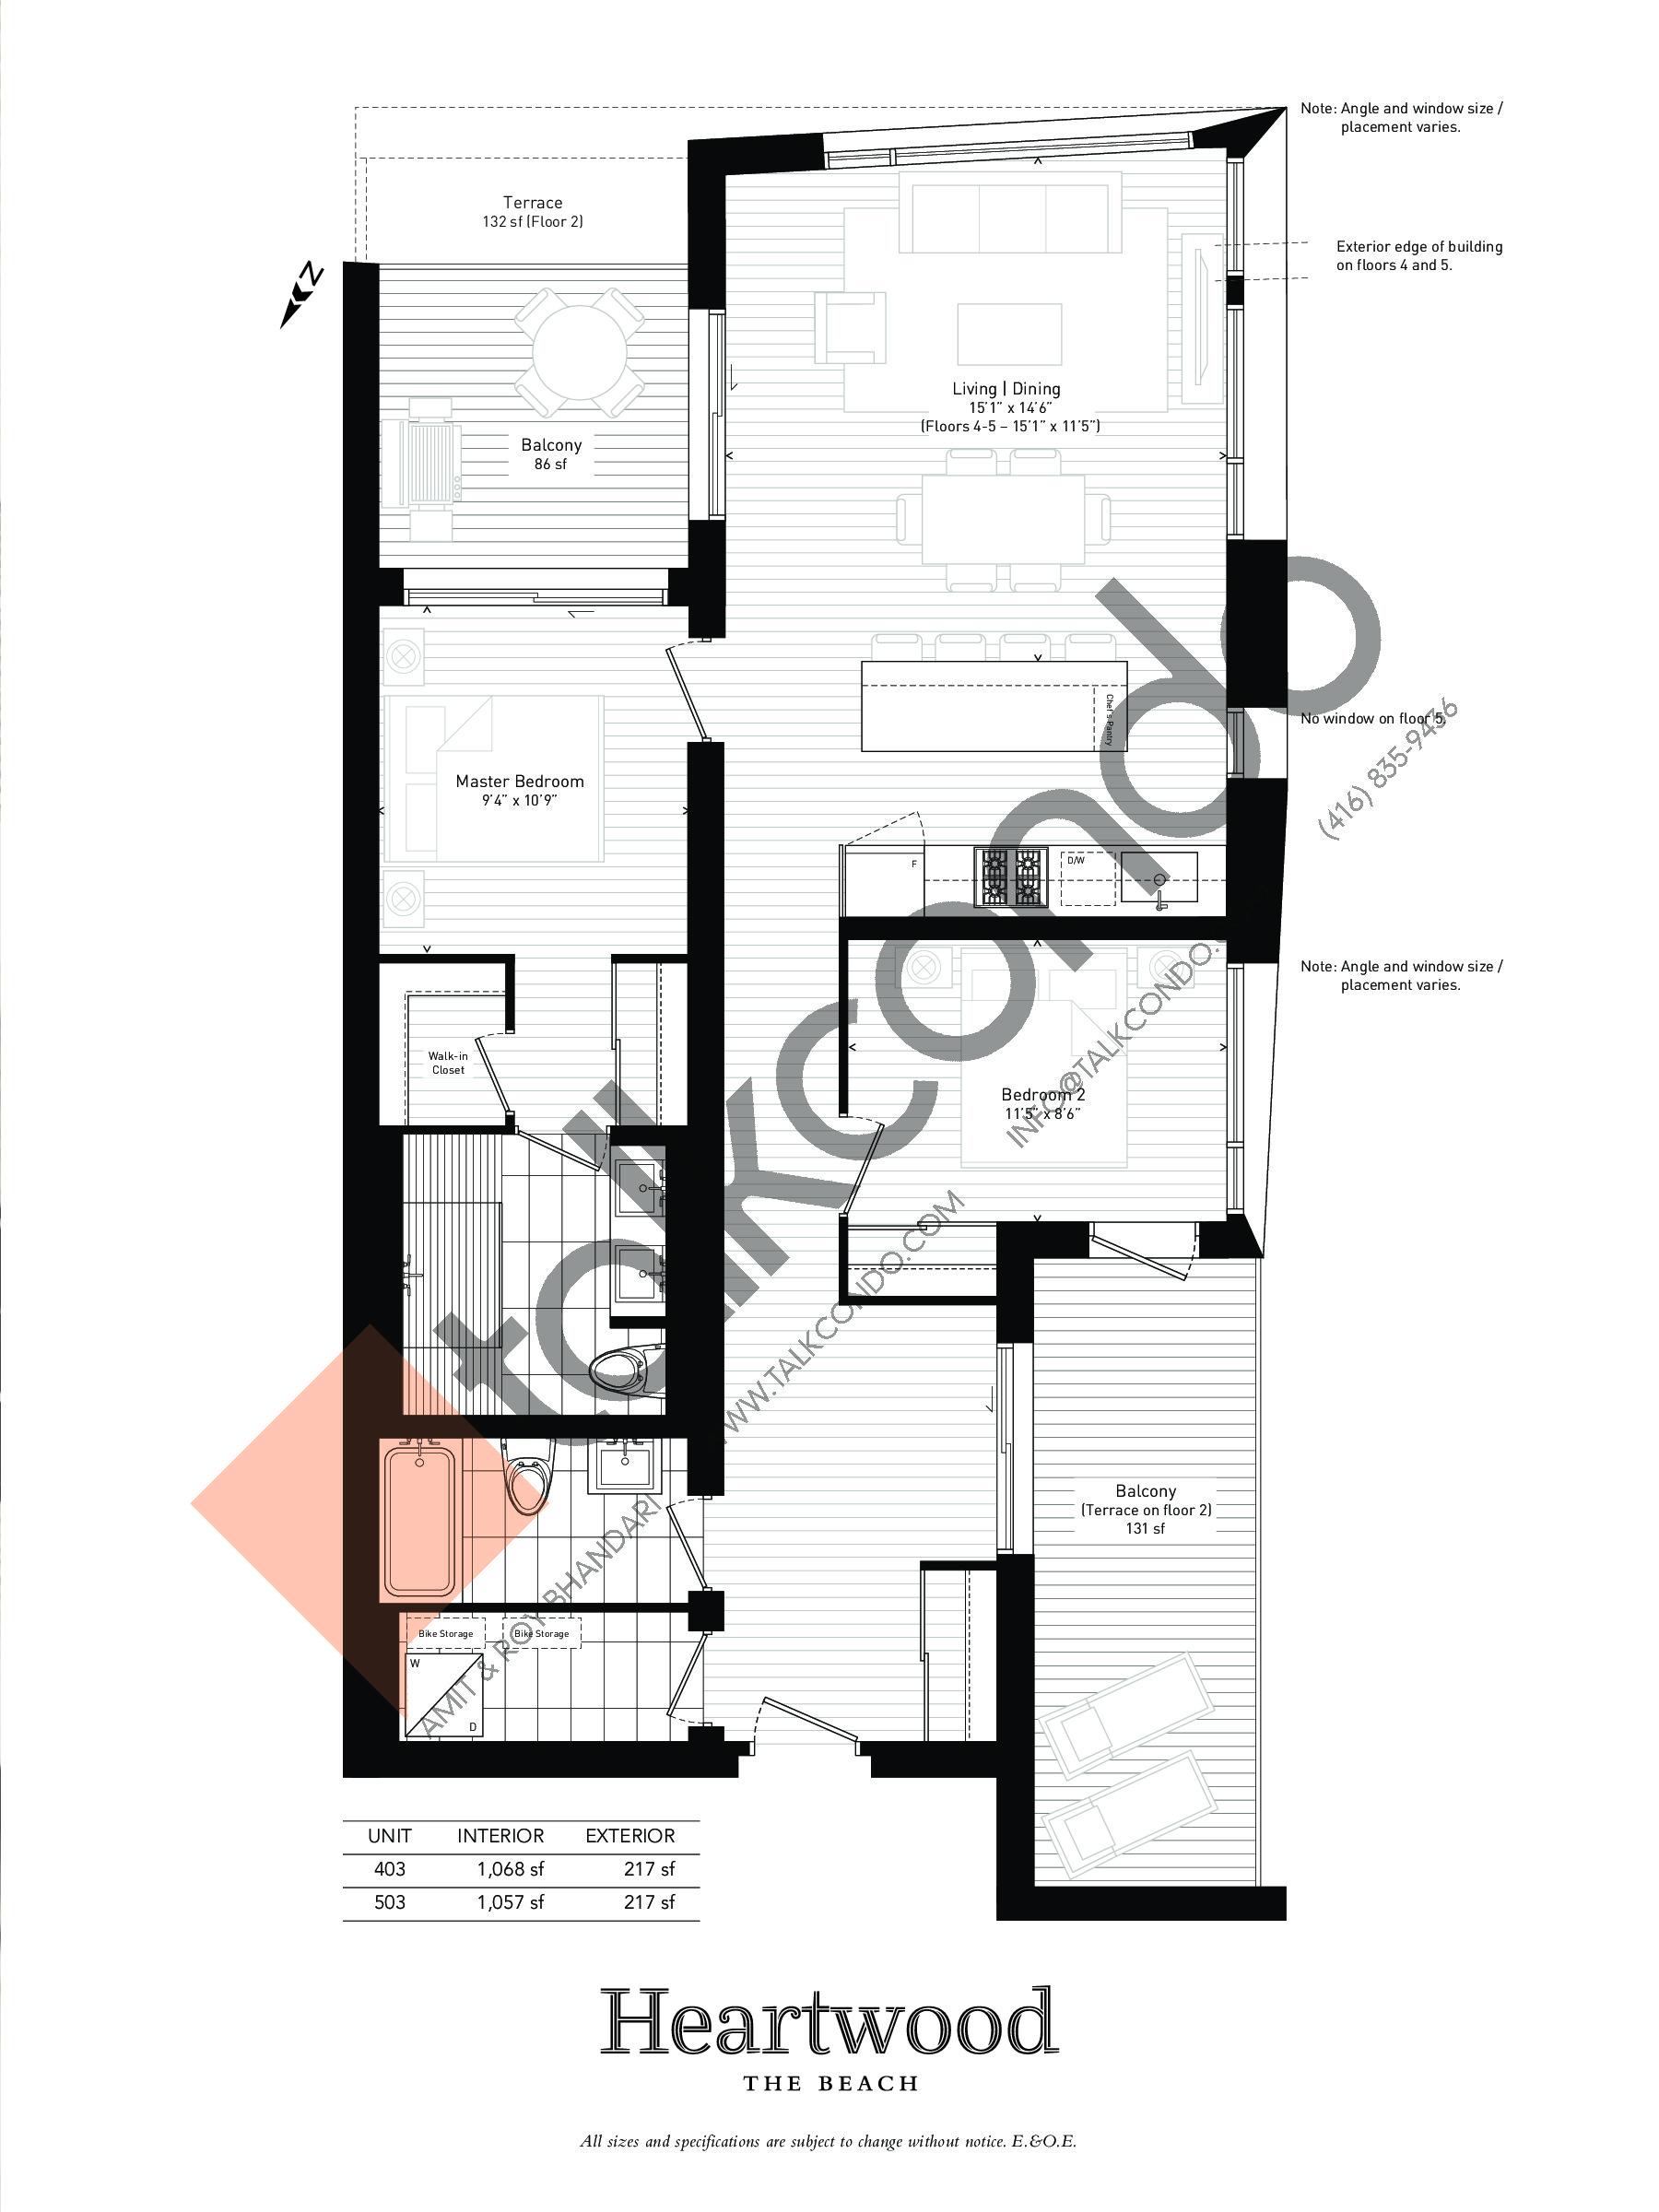 03 Floor Plan at Heartwood the Beach Condos - 1133 sq.ft